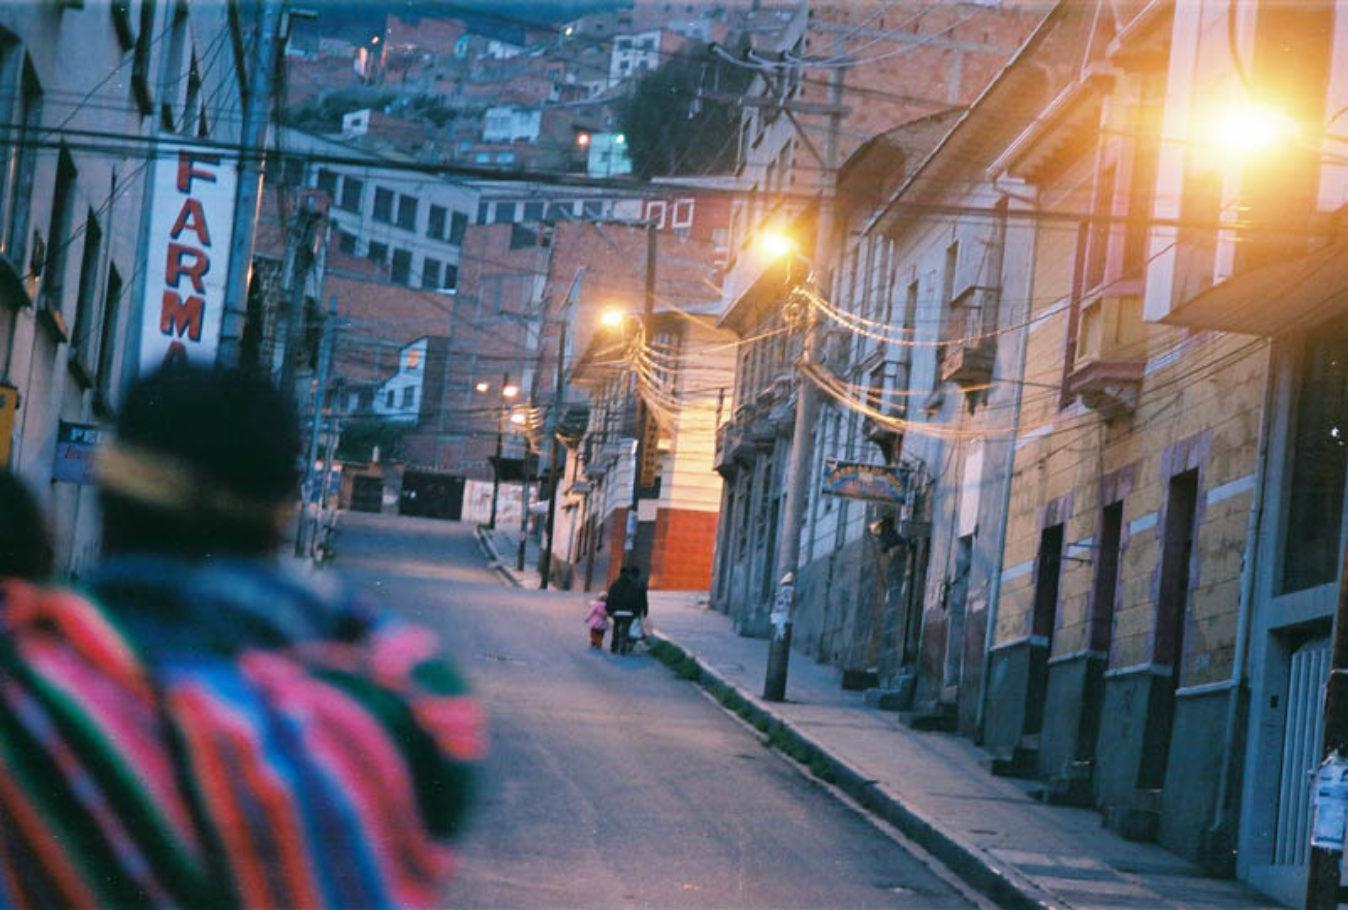 terminal la paz bolivia jorge ferrufino